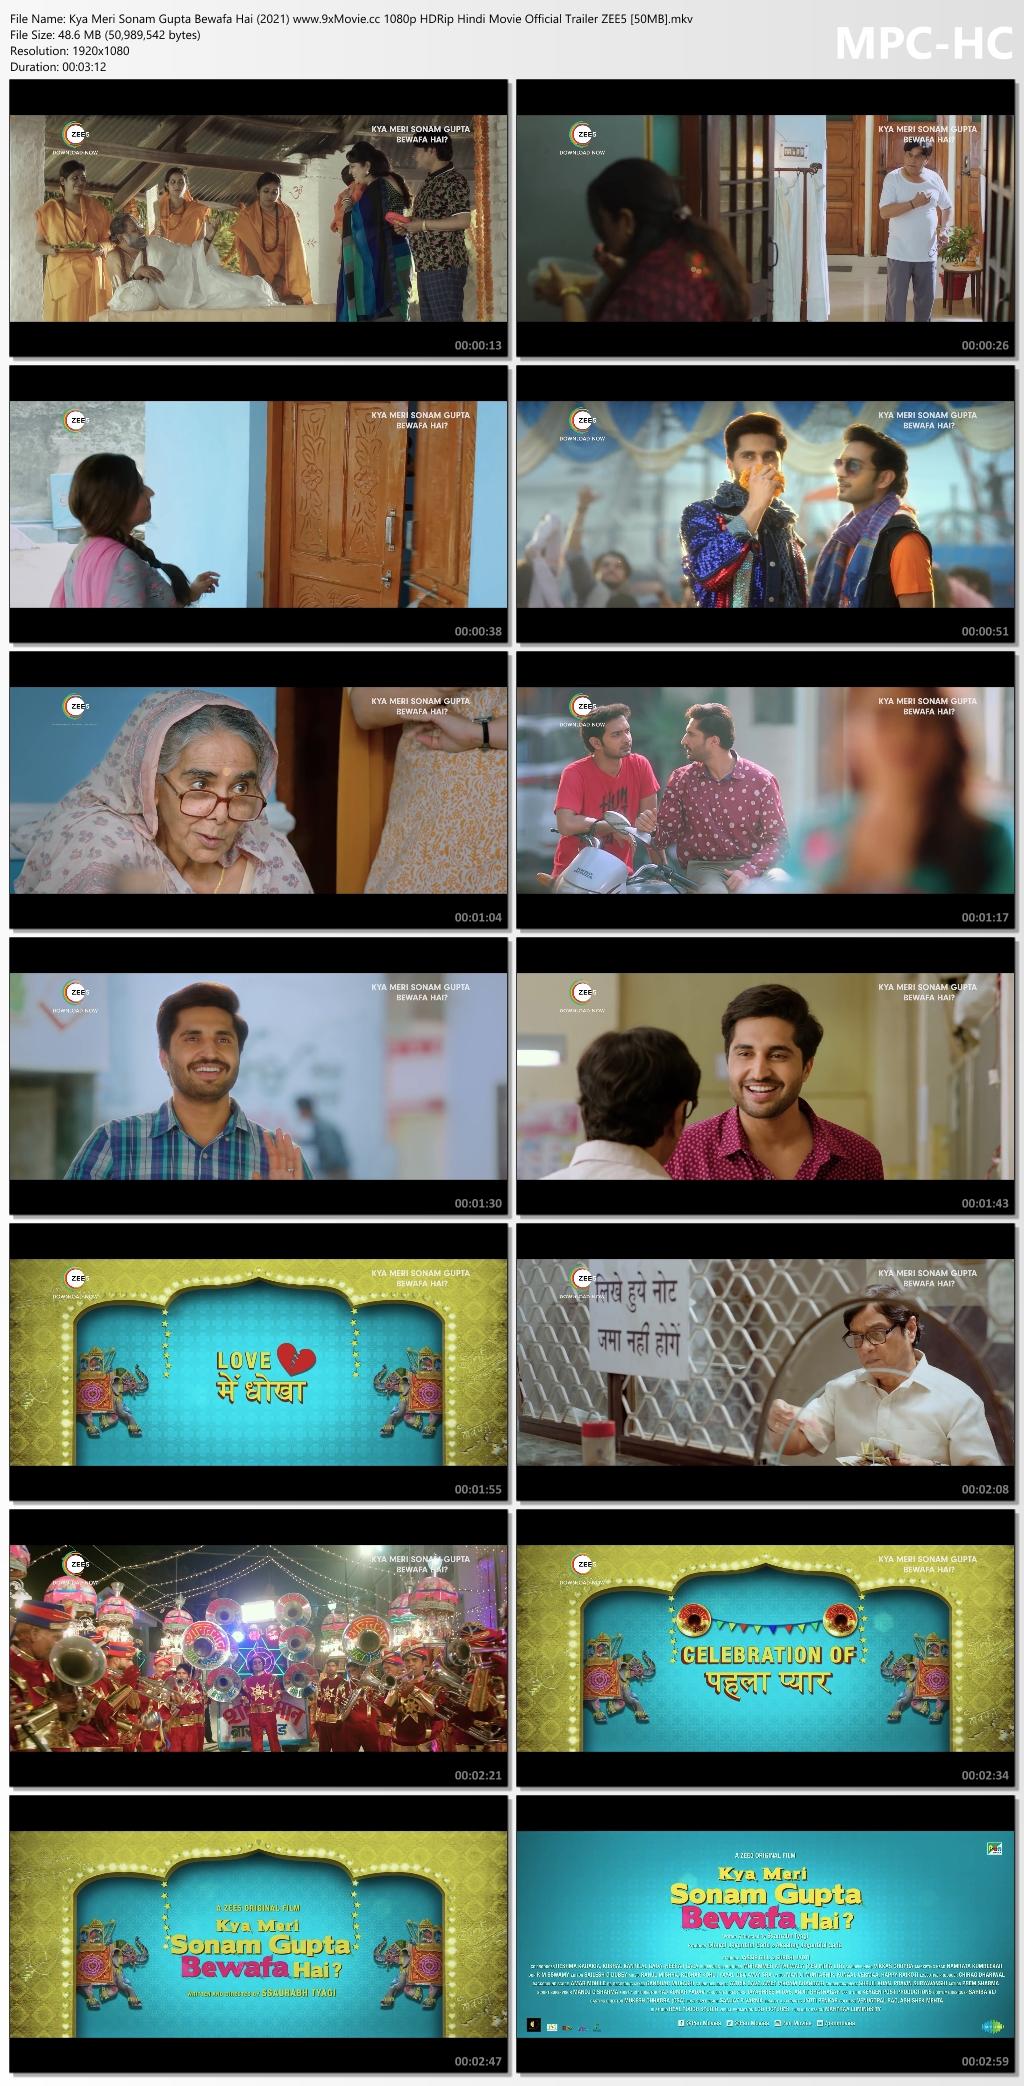 Kya-Meri-Sonam-Gupta-Bewafa-Hai-2021-www-9x-Movie-cc-1080p-HDRip-Hindi-Movie-Official-Trailer-ZEE5-5